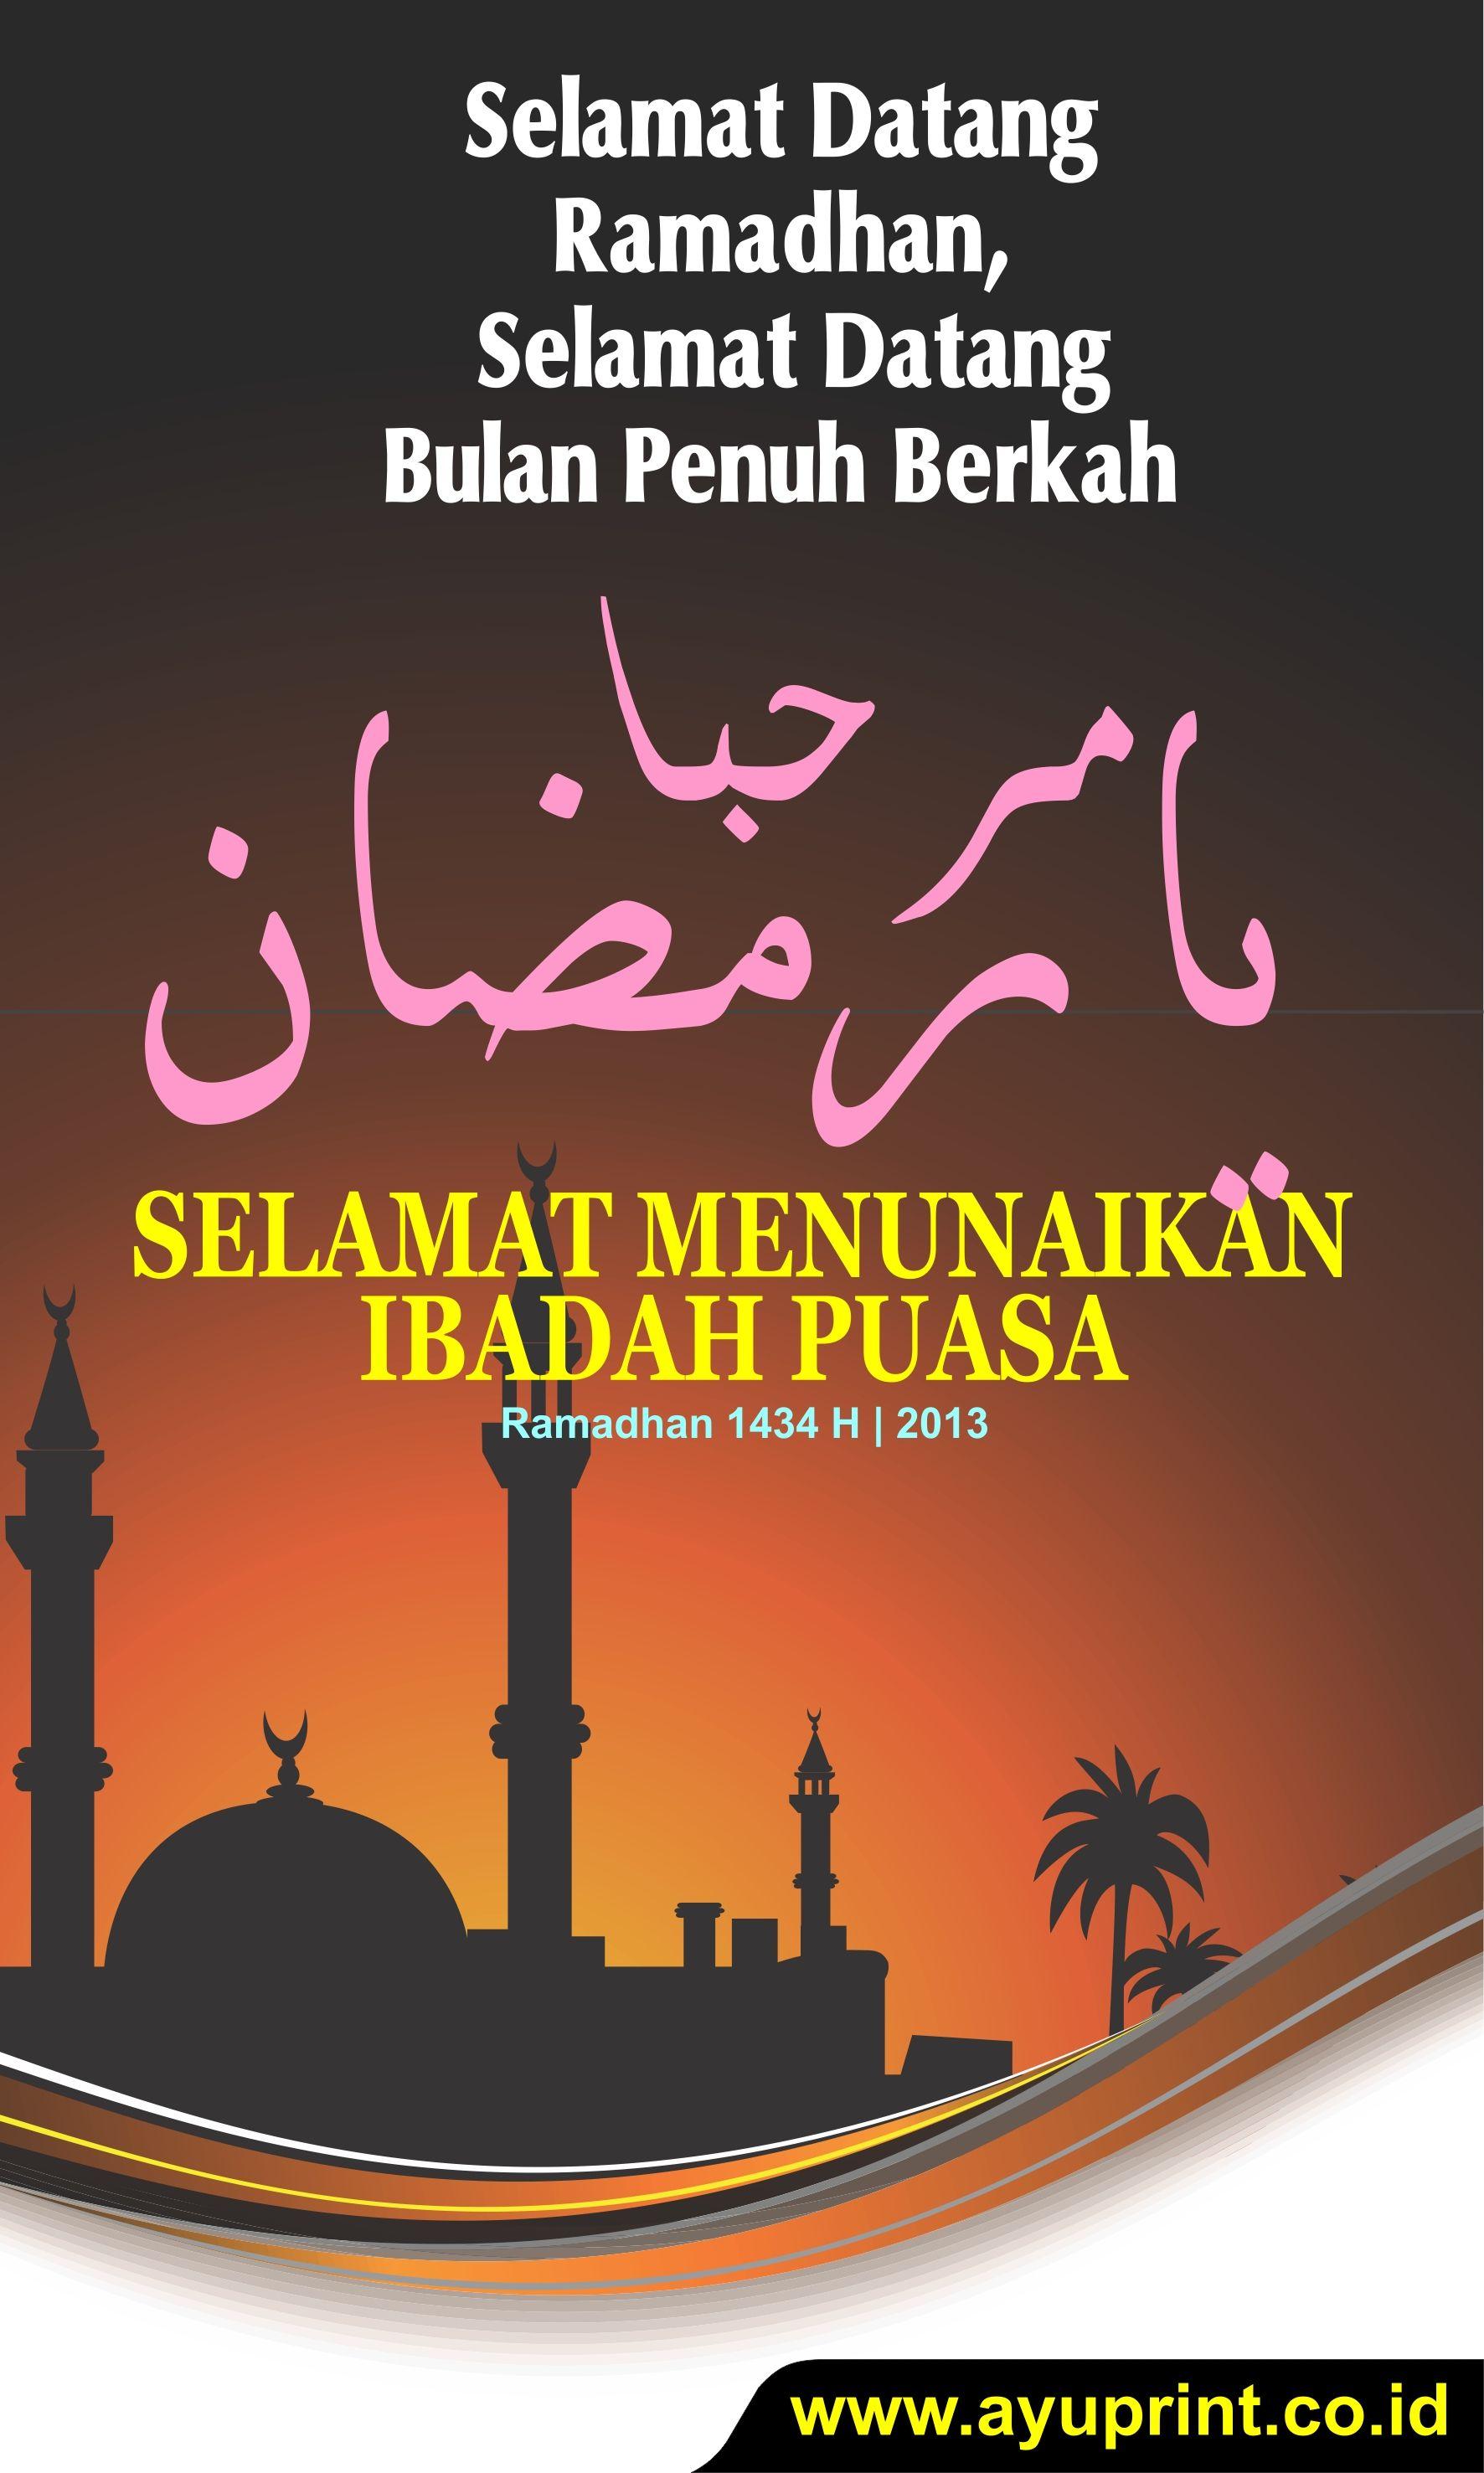 Design x banner pernikahan -  07 X Banner Spanduk Ramadhan 60 Cm X 160 Cm Masbadar 2015 M 1436 Vector Coreldraw13 14 15 16 17 Photoshop Pdf Spanduk Banner Ramadhan Pinterest